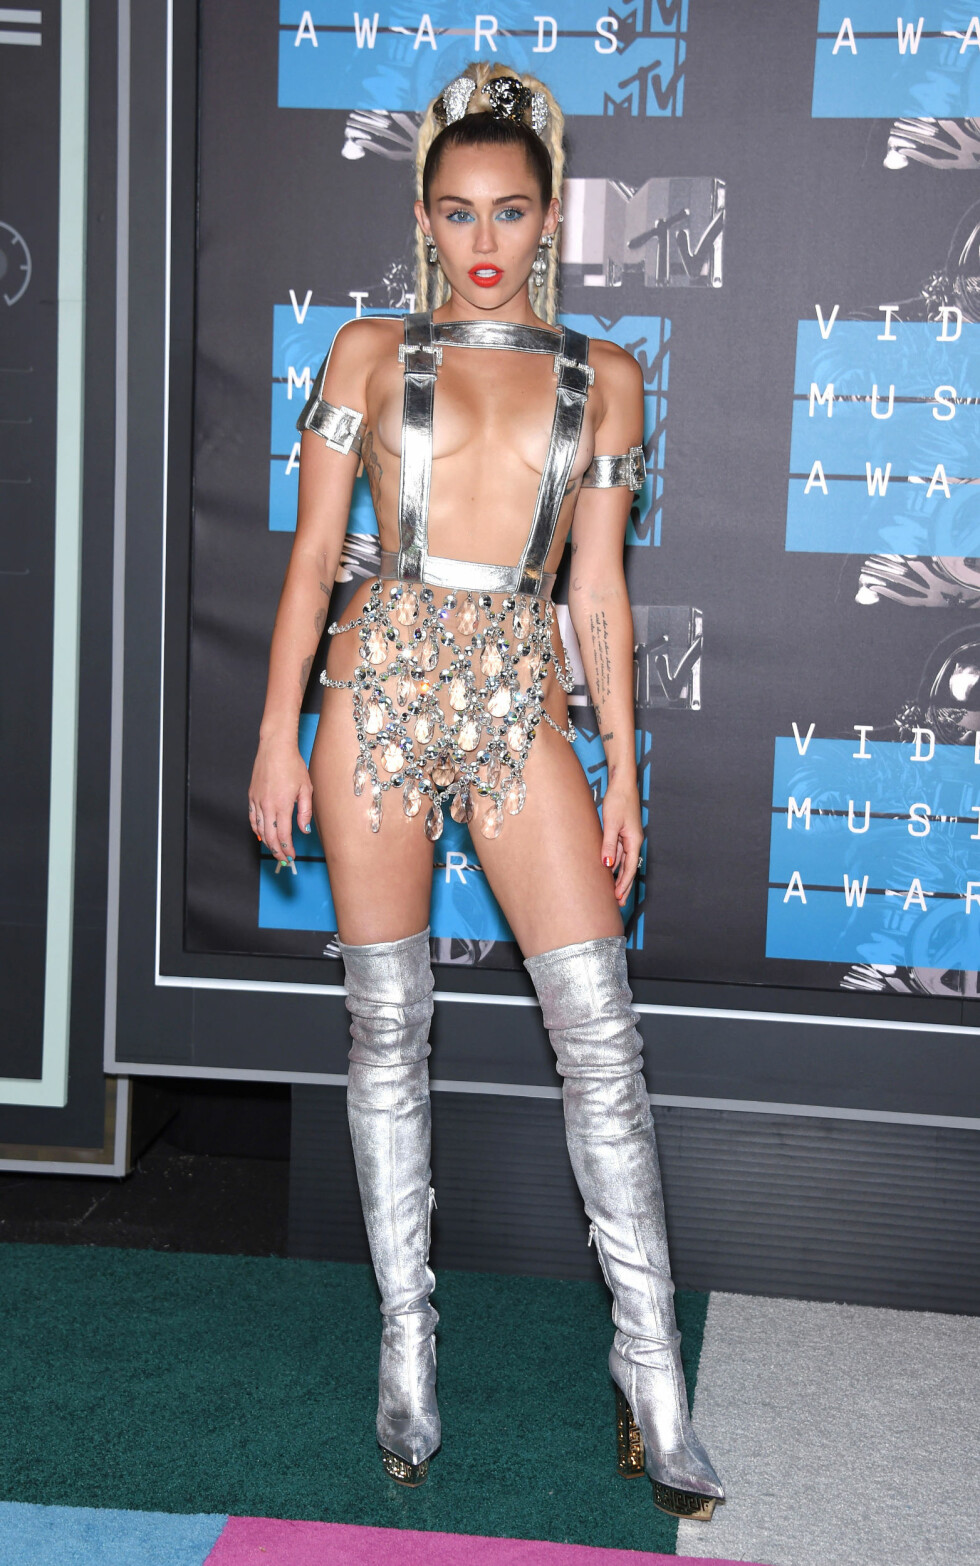 SØLV: Miley Cyrus fotografert under MTV Video Music Awards i 2015. Foto: NTB Scanpix